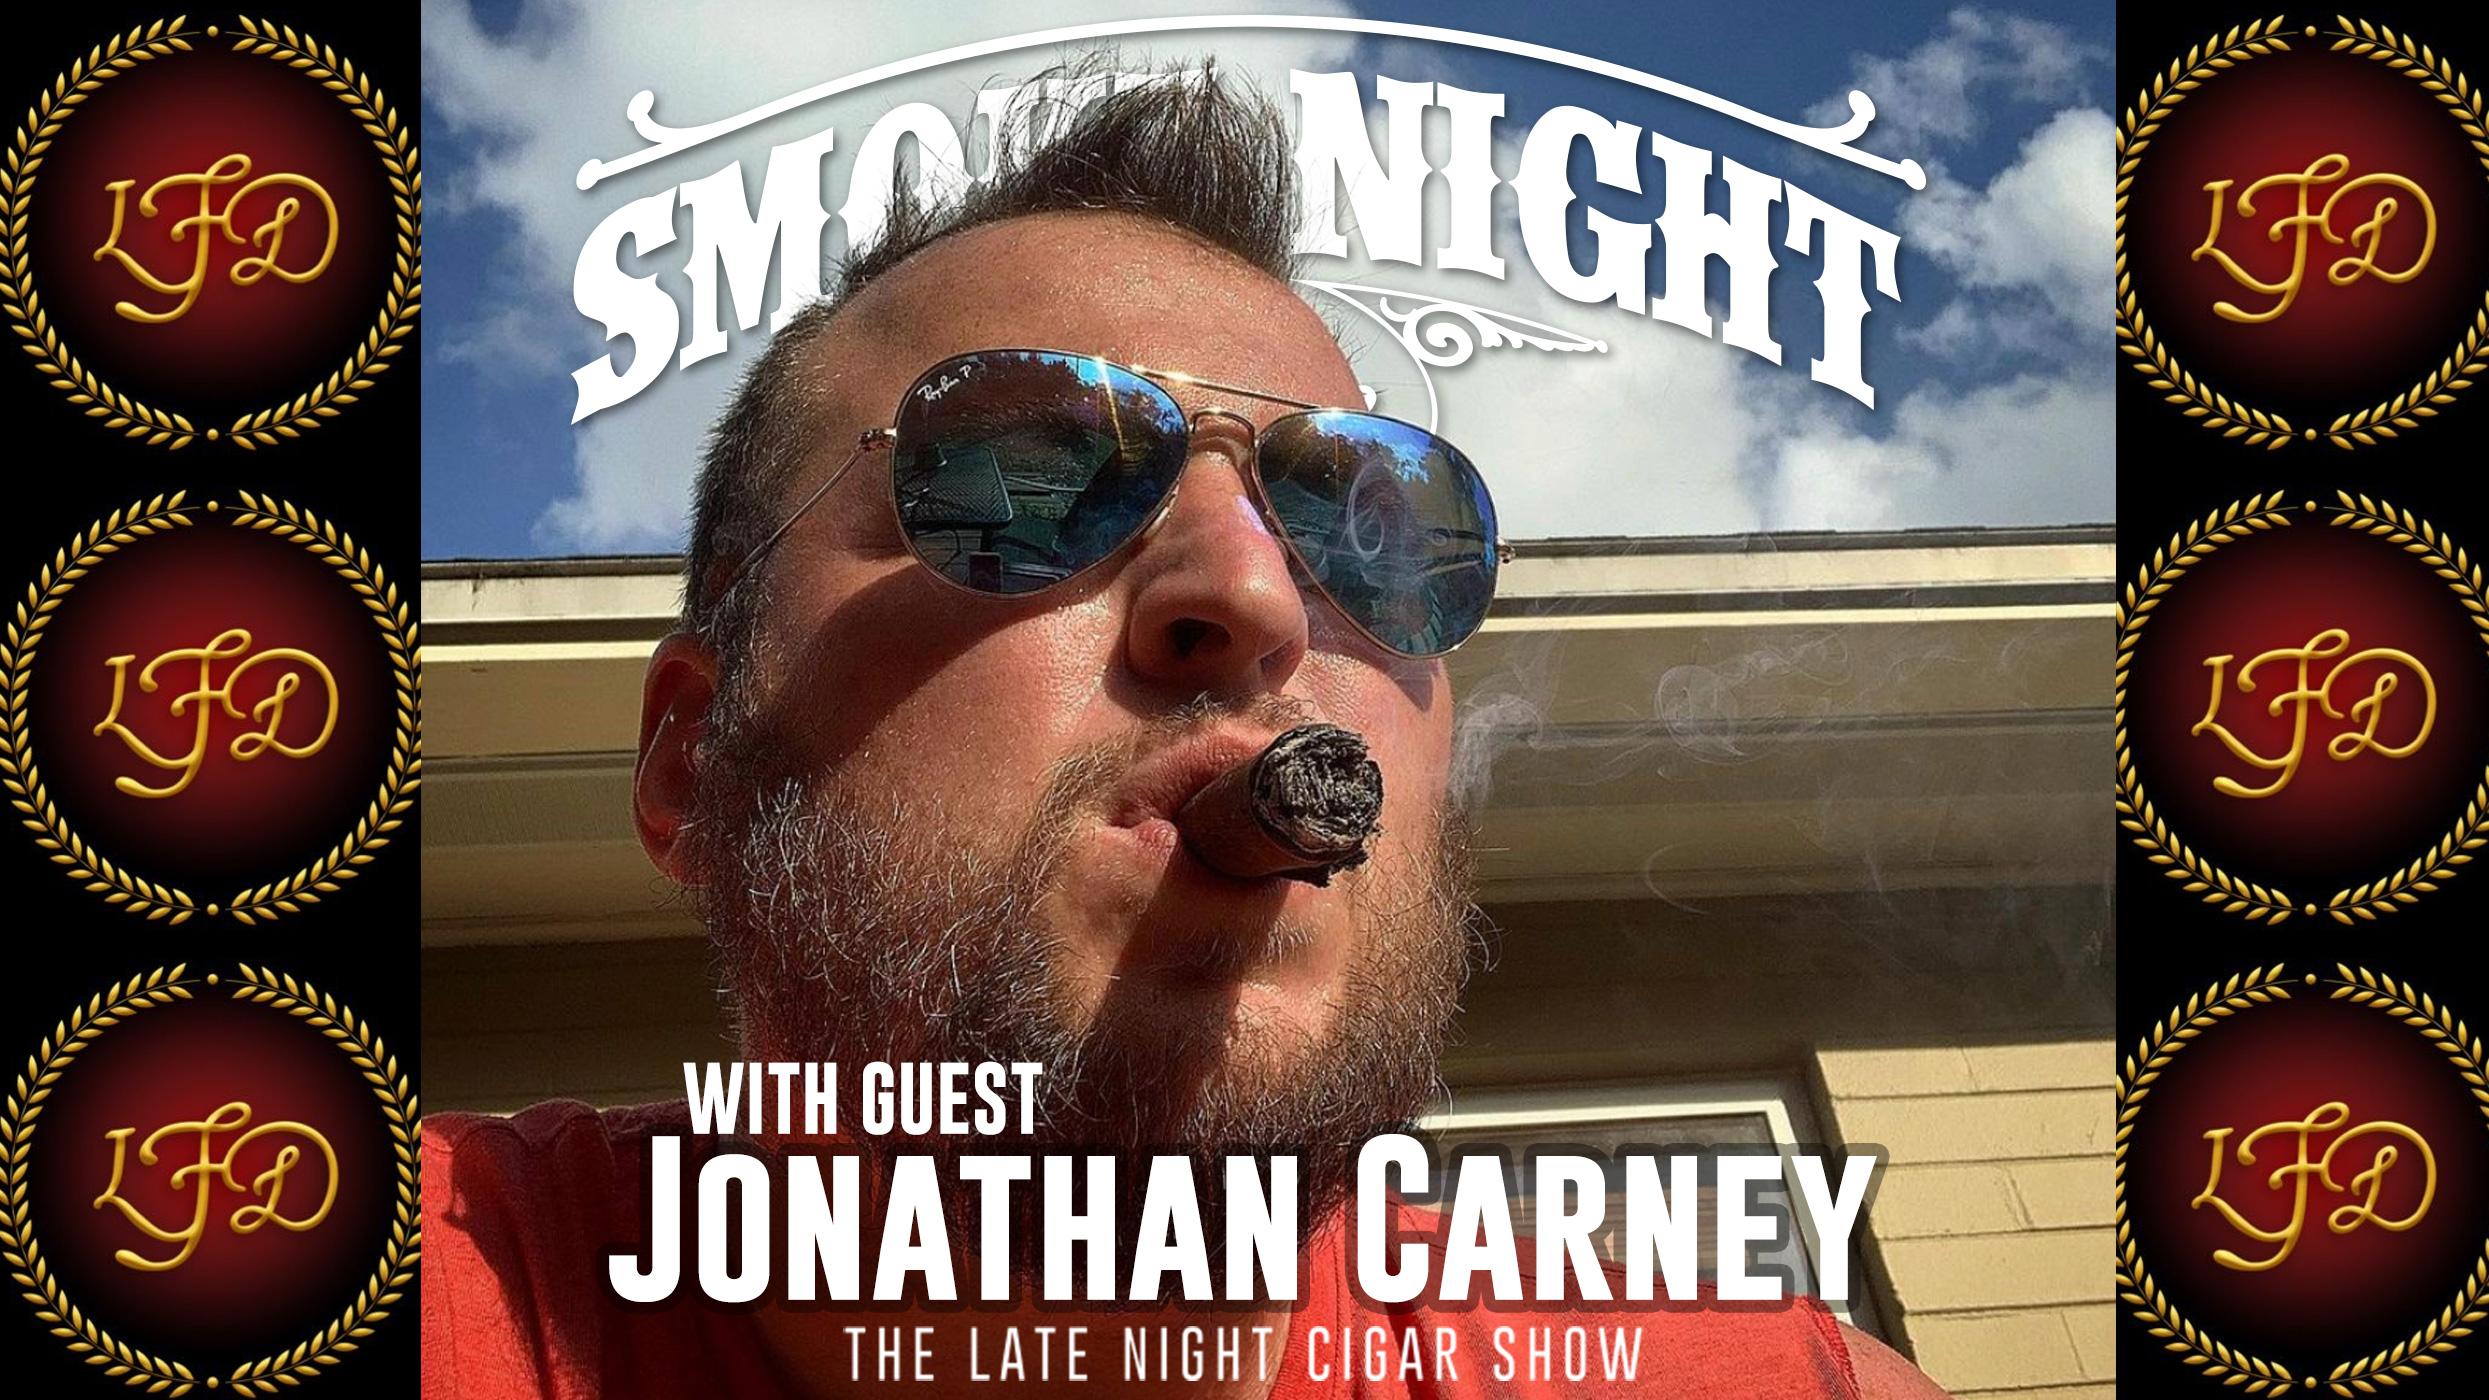 Jonathan Carney LFD